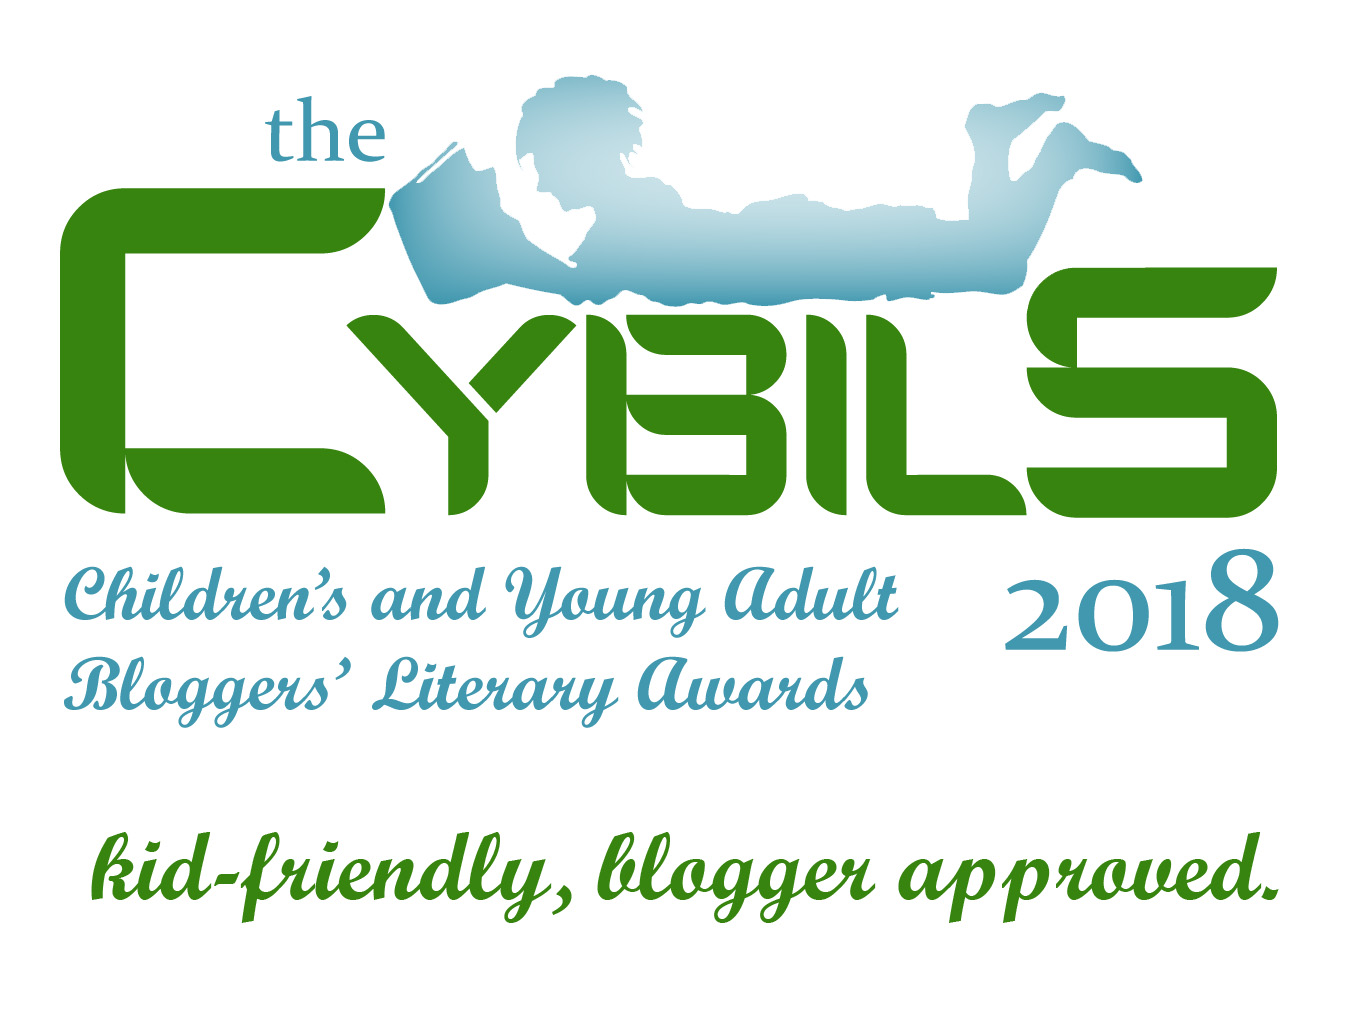 https://i2.wp.com/www.cybils.com/wp-content/uploads/2018/08/Cybils-Logo-2018-Slogan.jpg